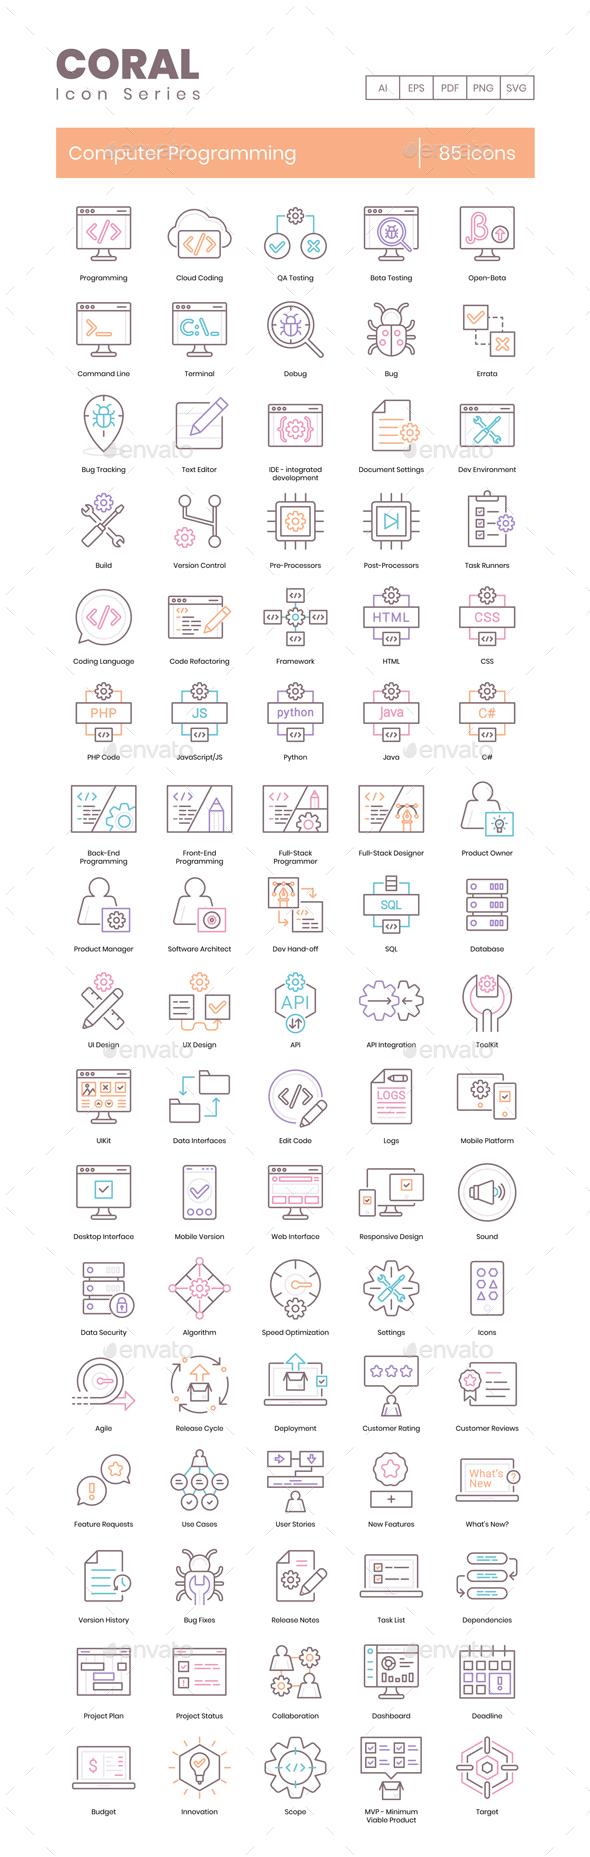 85 Computer Programming Icons - Coral Series